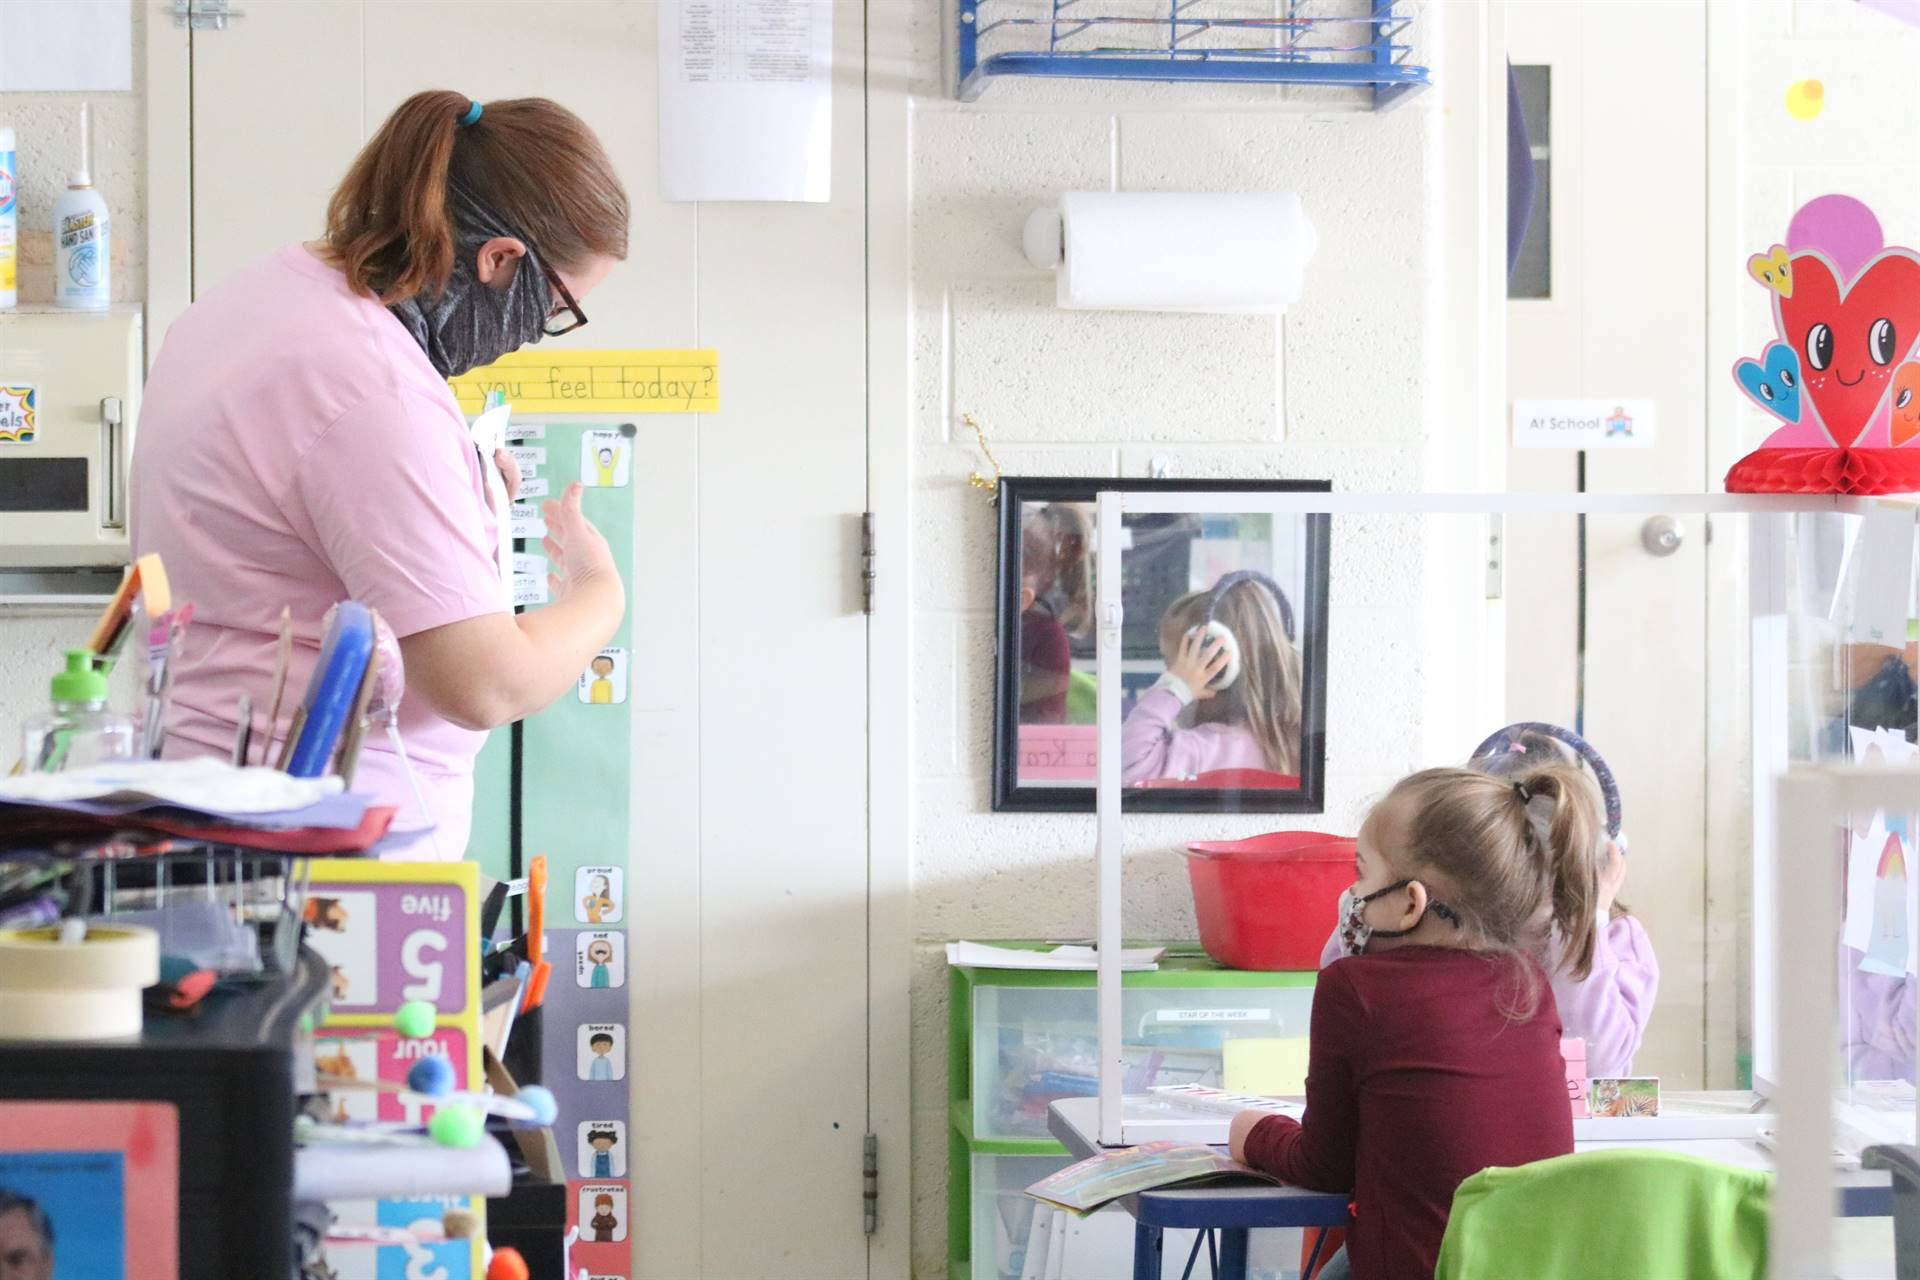 teacher talking to 2 girls